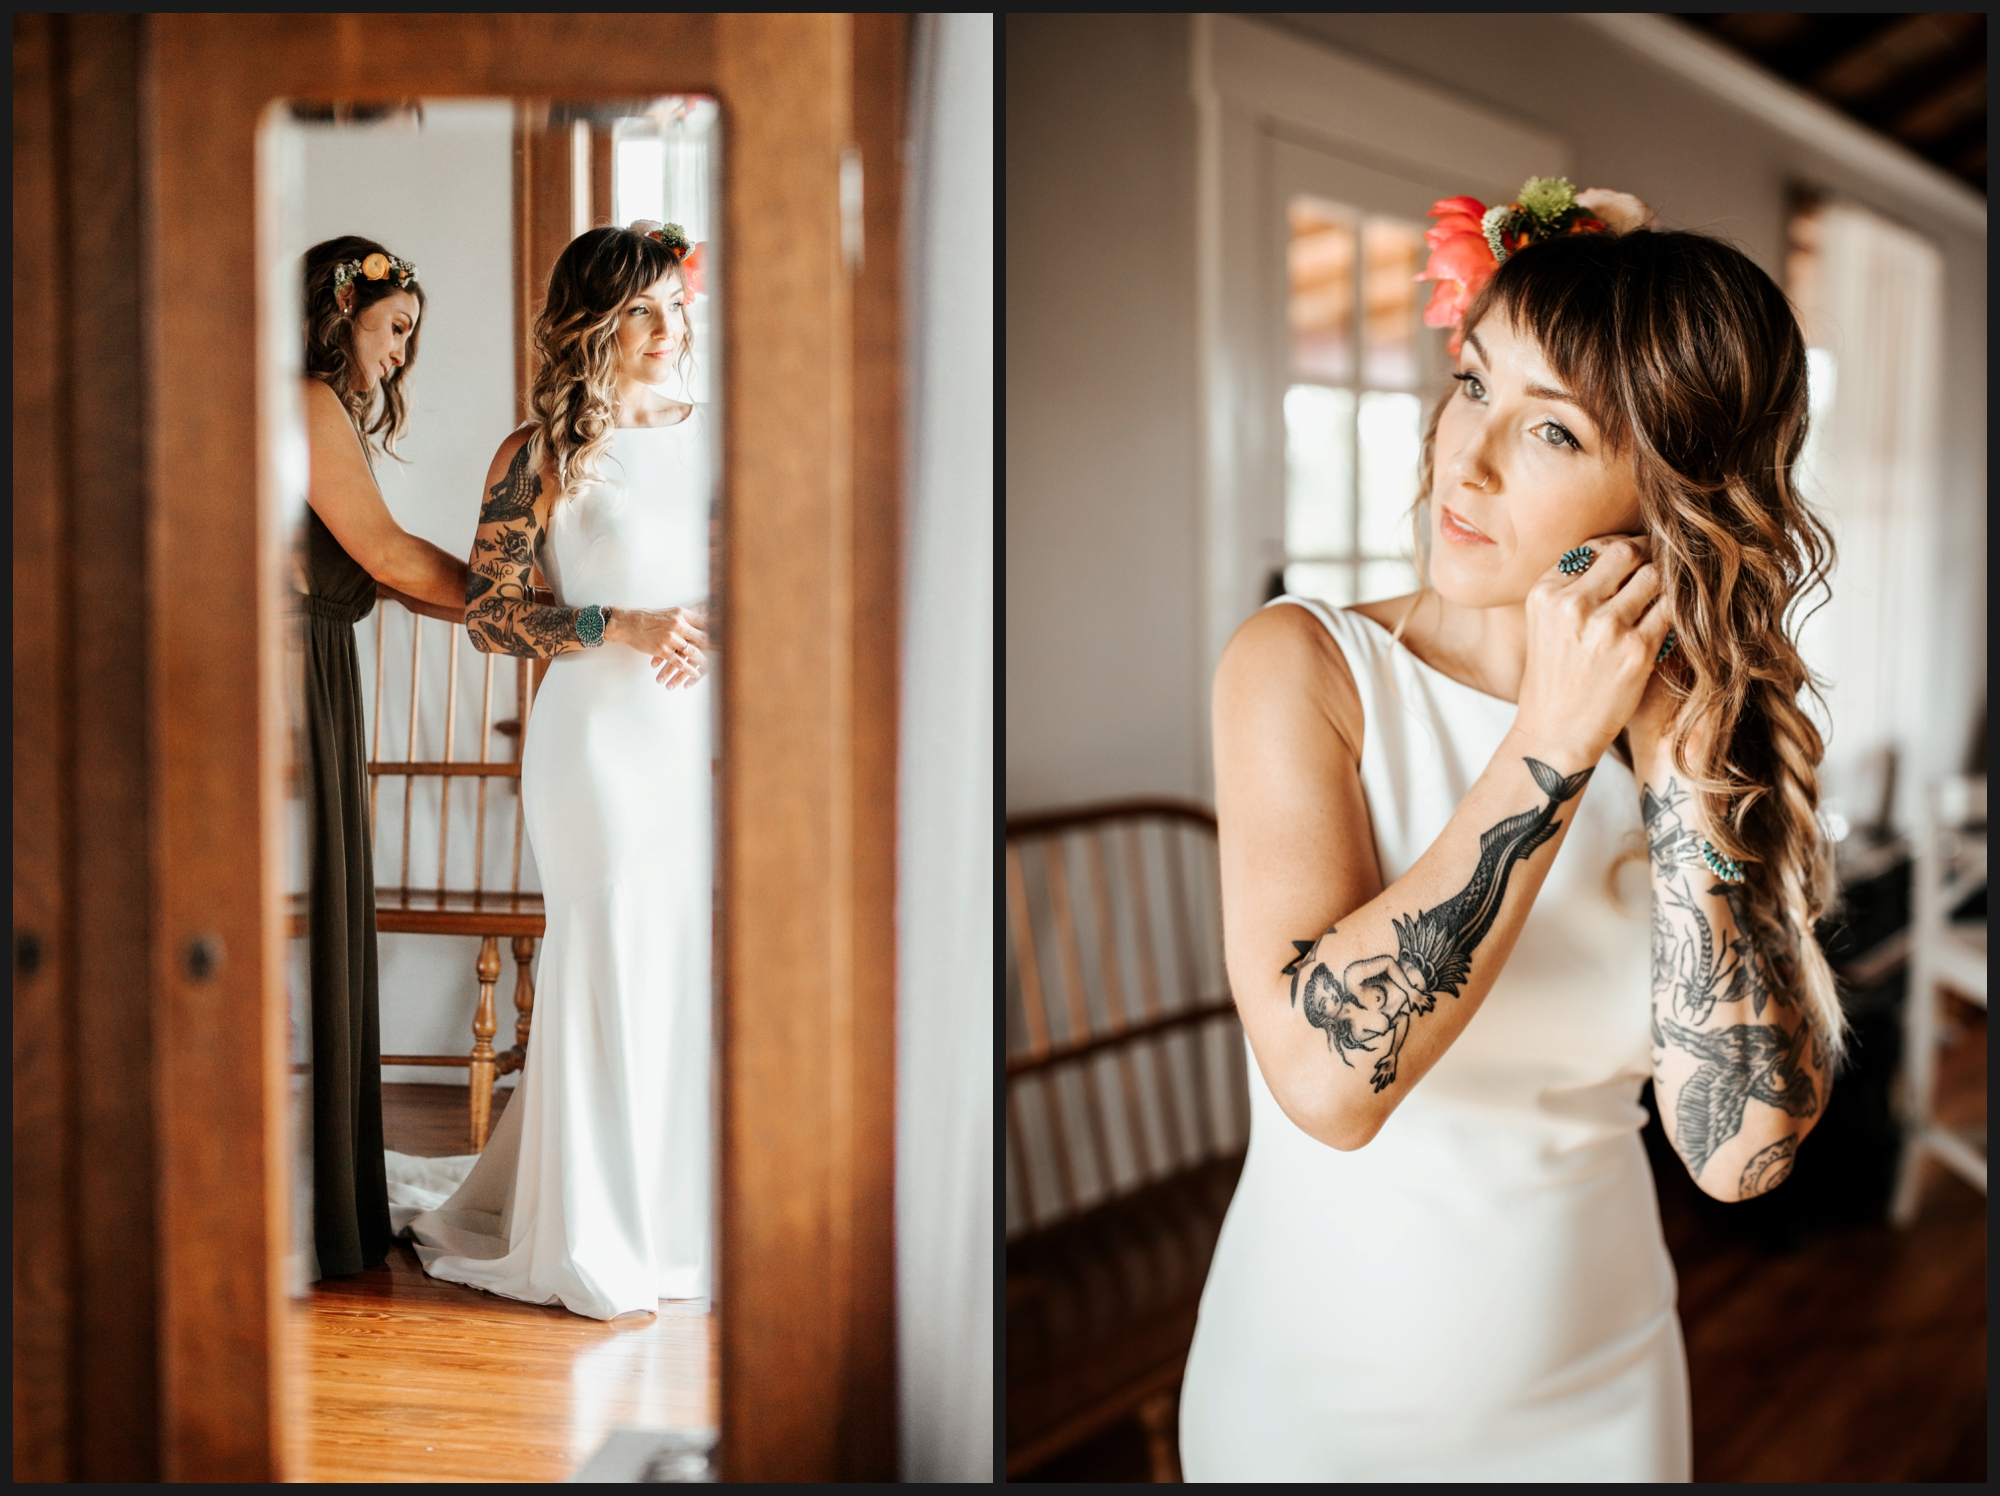 Orlando-Wedding-Photographer-destination-wedding-photographer-florida-wedding-photographer-bohemian-wedding-photographer_1942.jpg